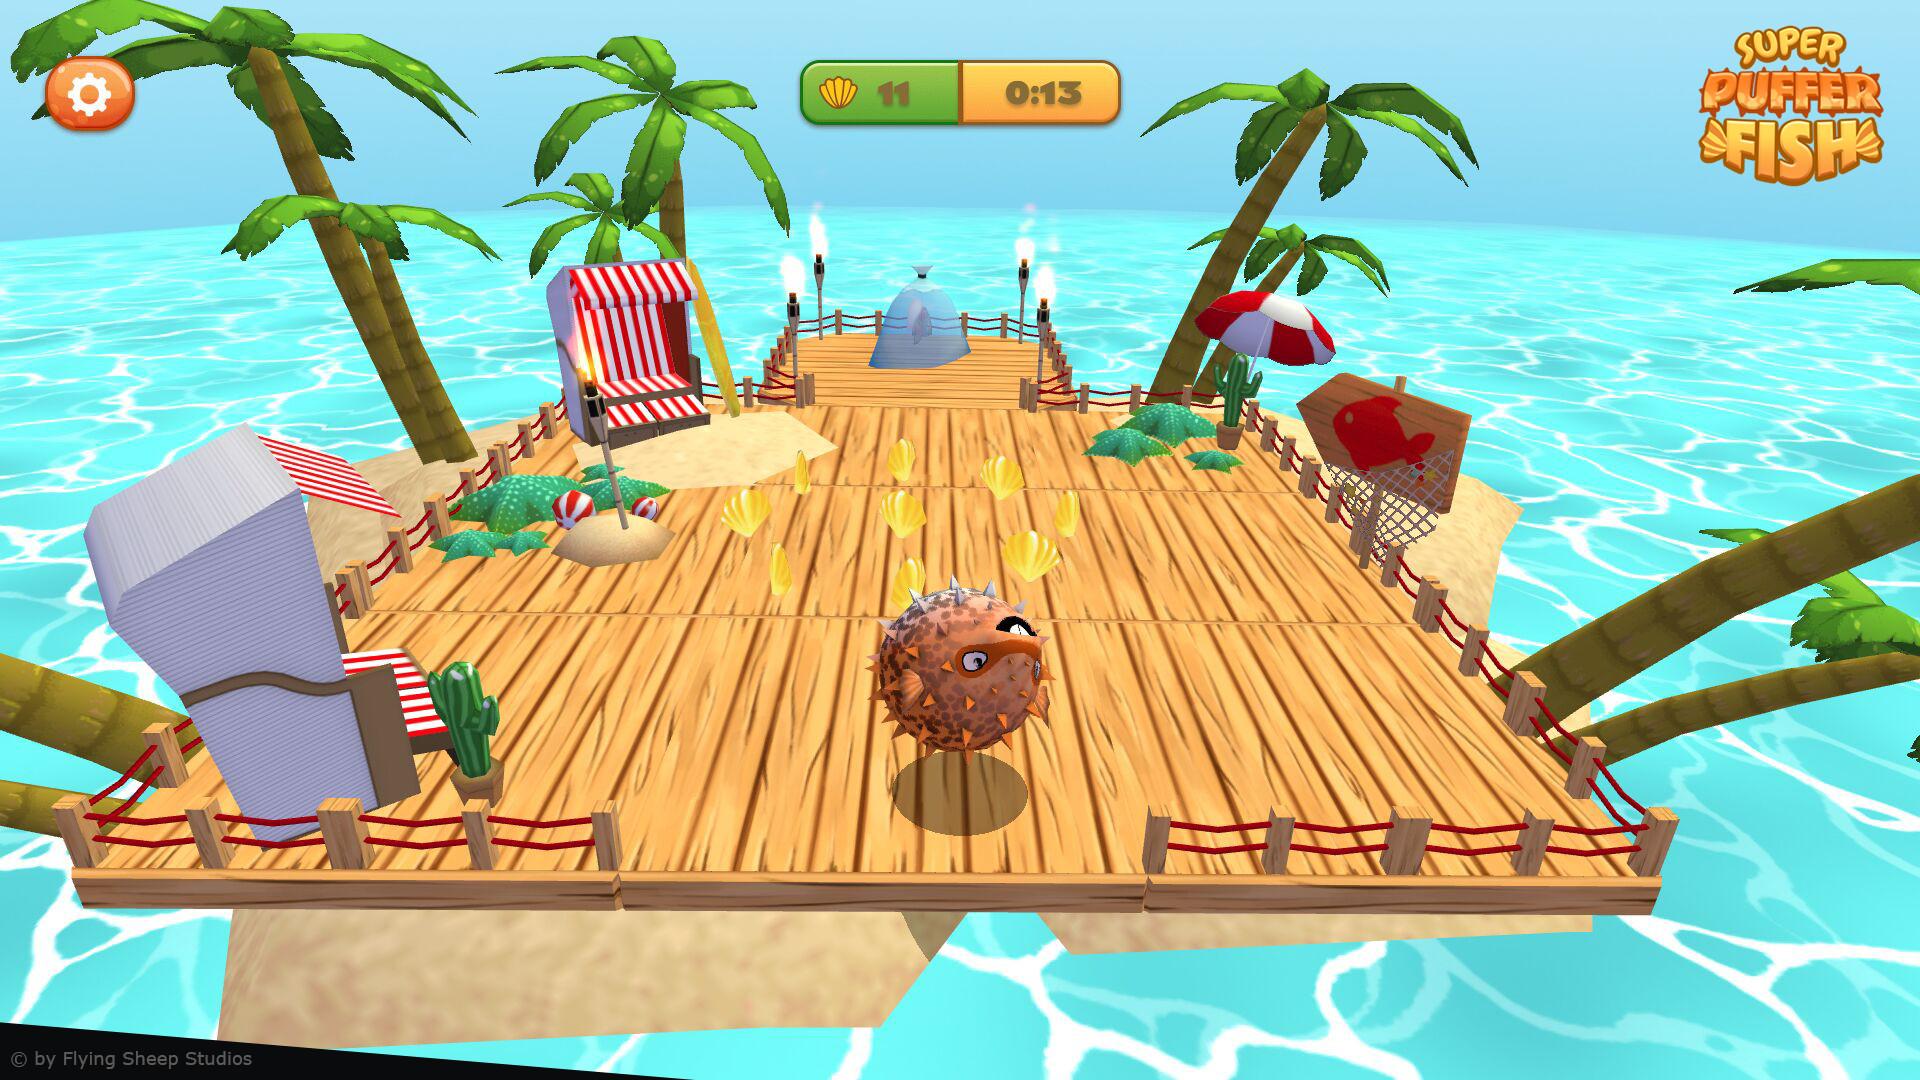 Marina hahn pufferfish screenshot 3